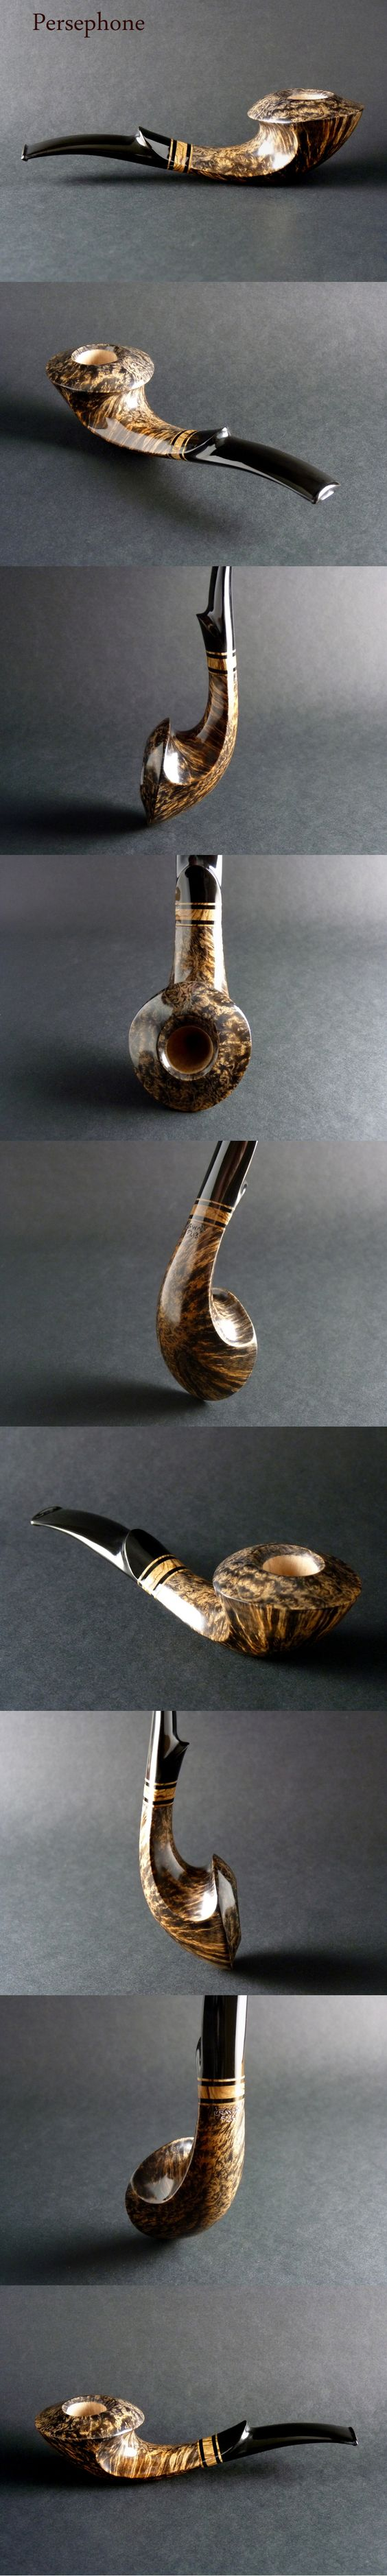 pipes de reve - Page 5 5693cf1e012a03fedf9e9f8df13993aa